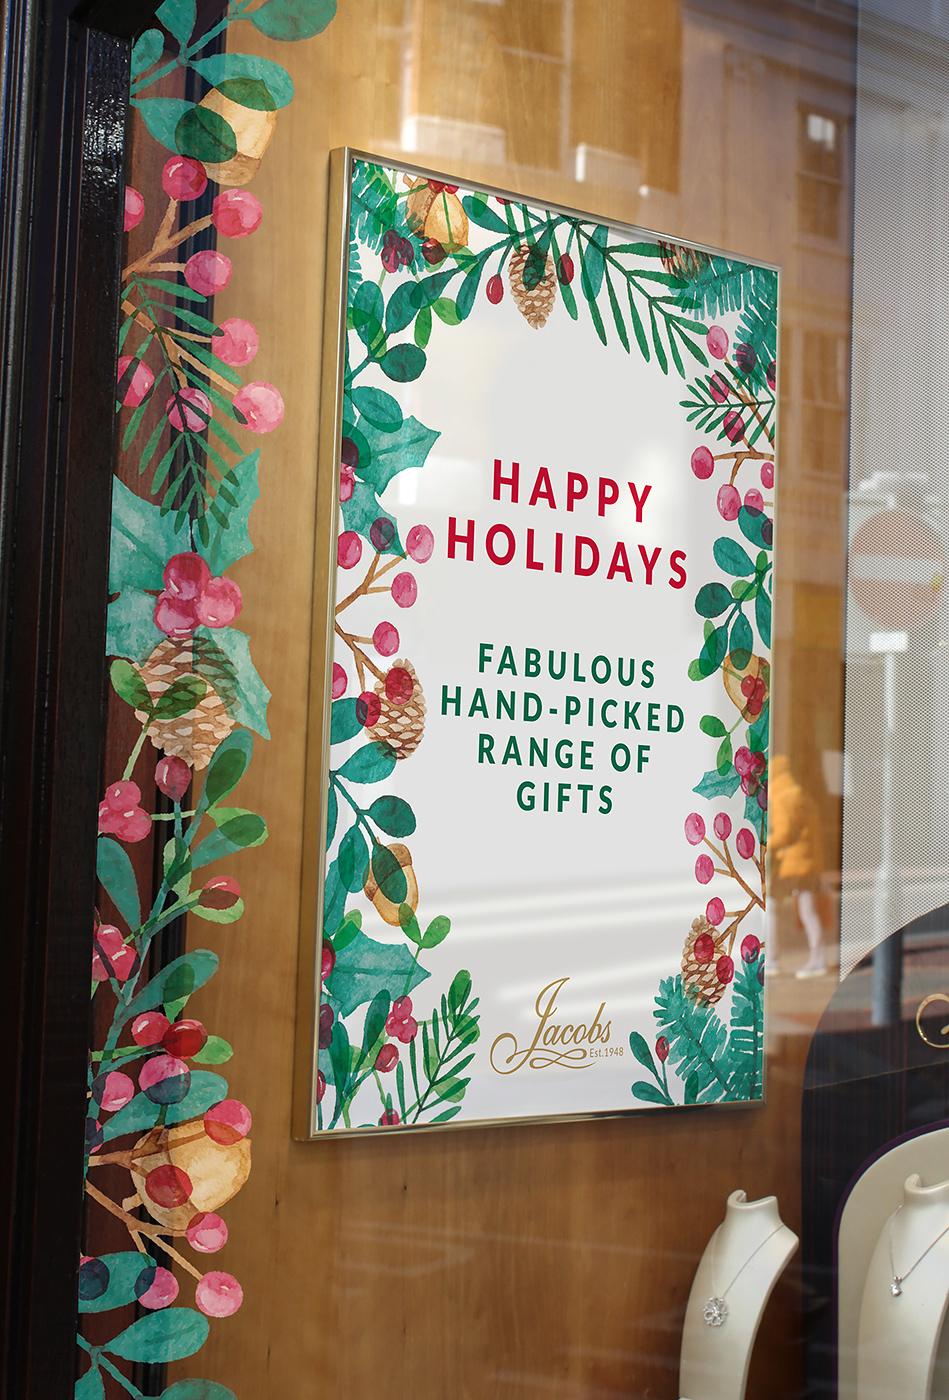 Jacobs Christmas 2019 Windows and Poster